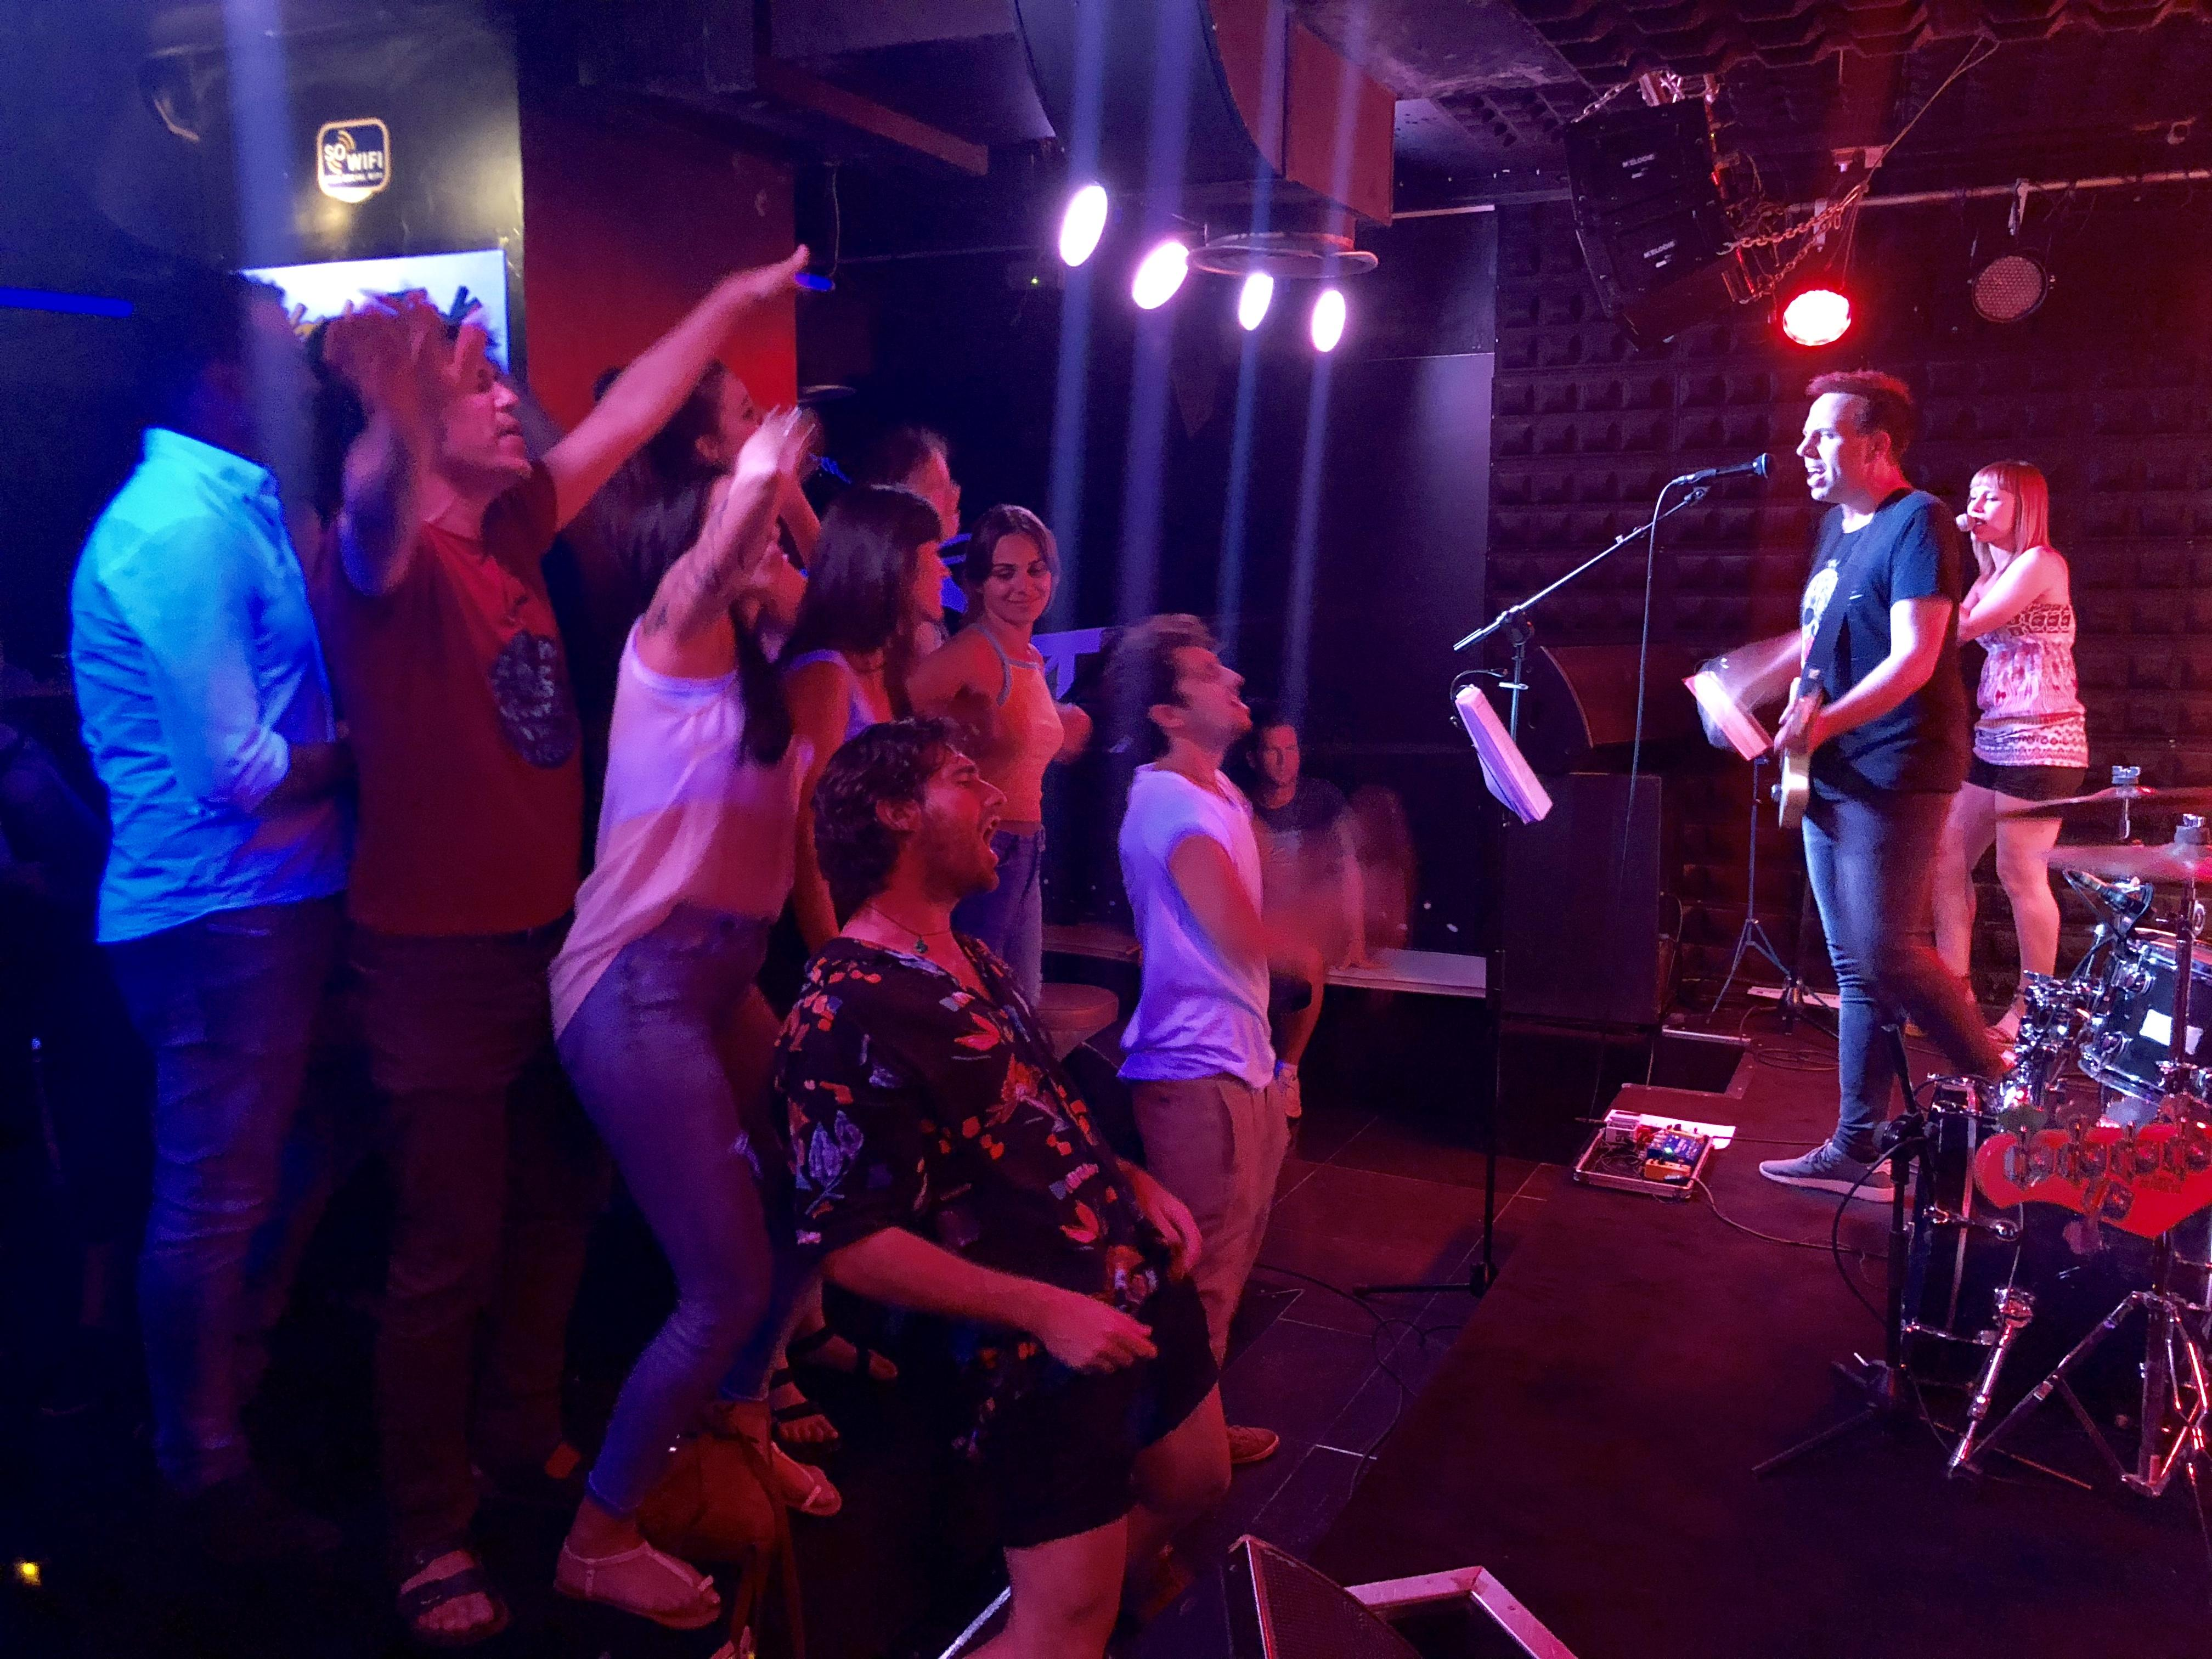 Discover Madrid's Live Music Scene / Ruta de música en vivo! Tuesday Night